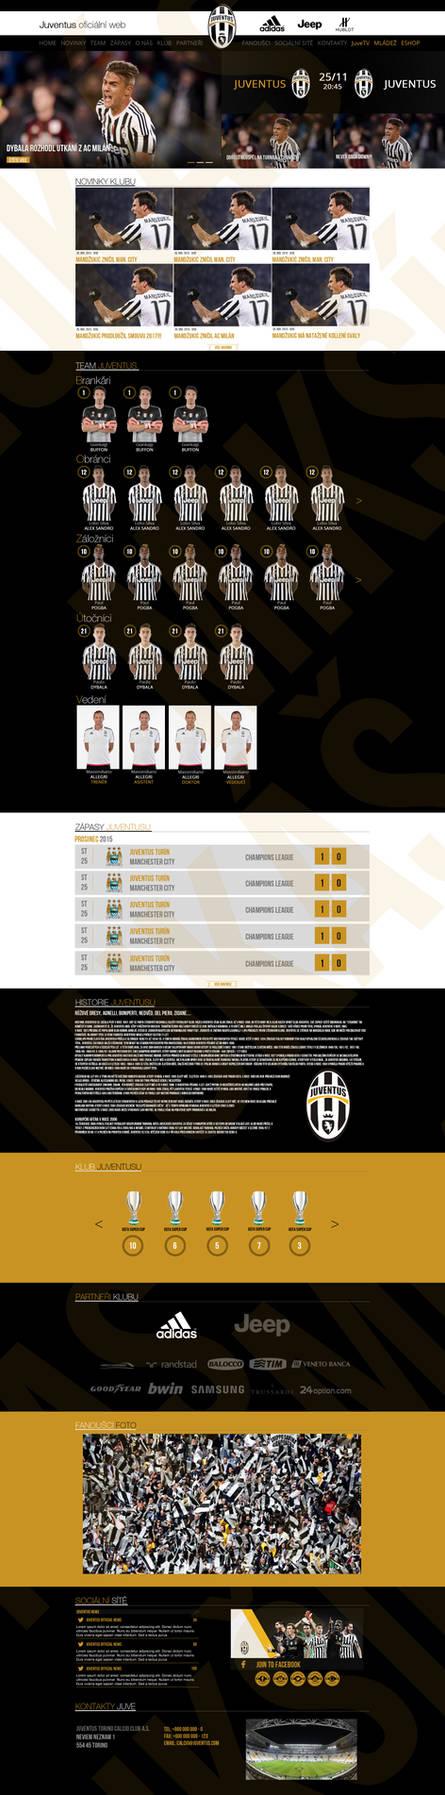 Juventus unofficial